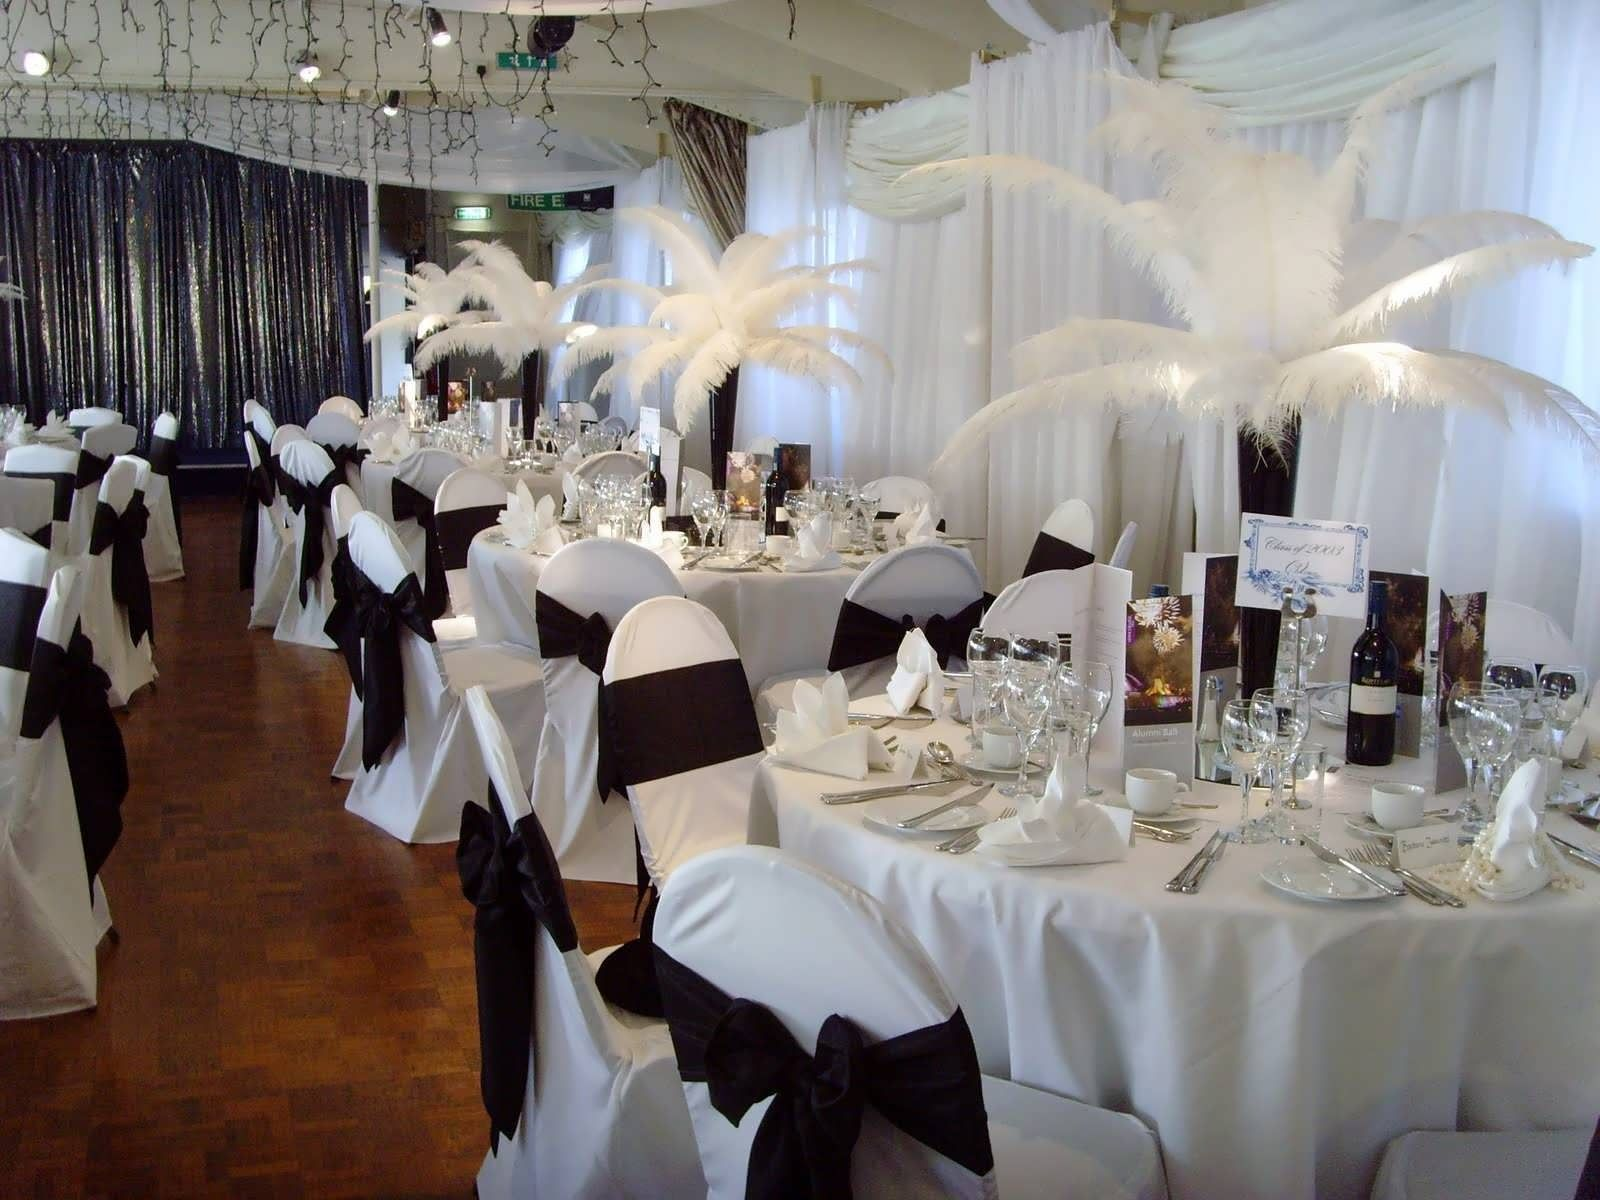 Wedding Decorations Wholesale For Reception Decorations Wedding